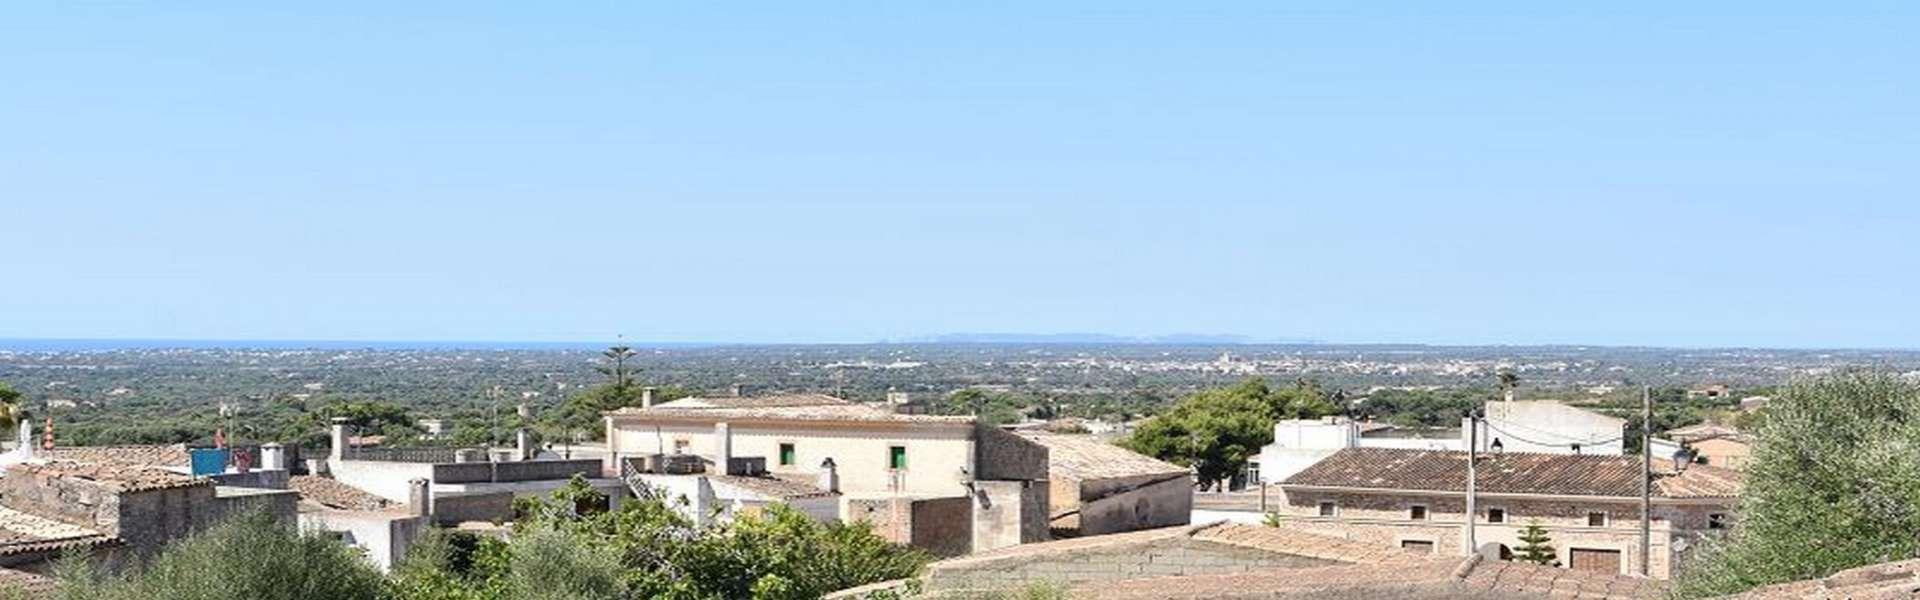 Einmaliges Baugrundstück mit Meerblick in Alqueria Blanca